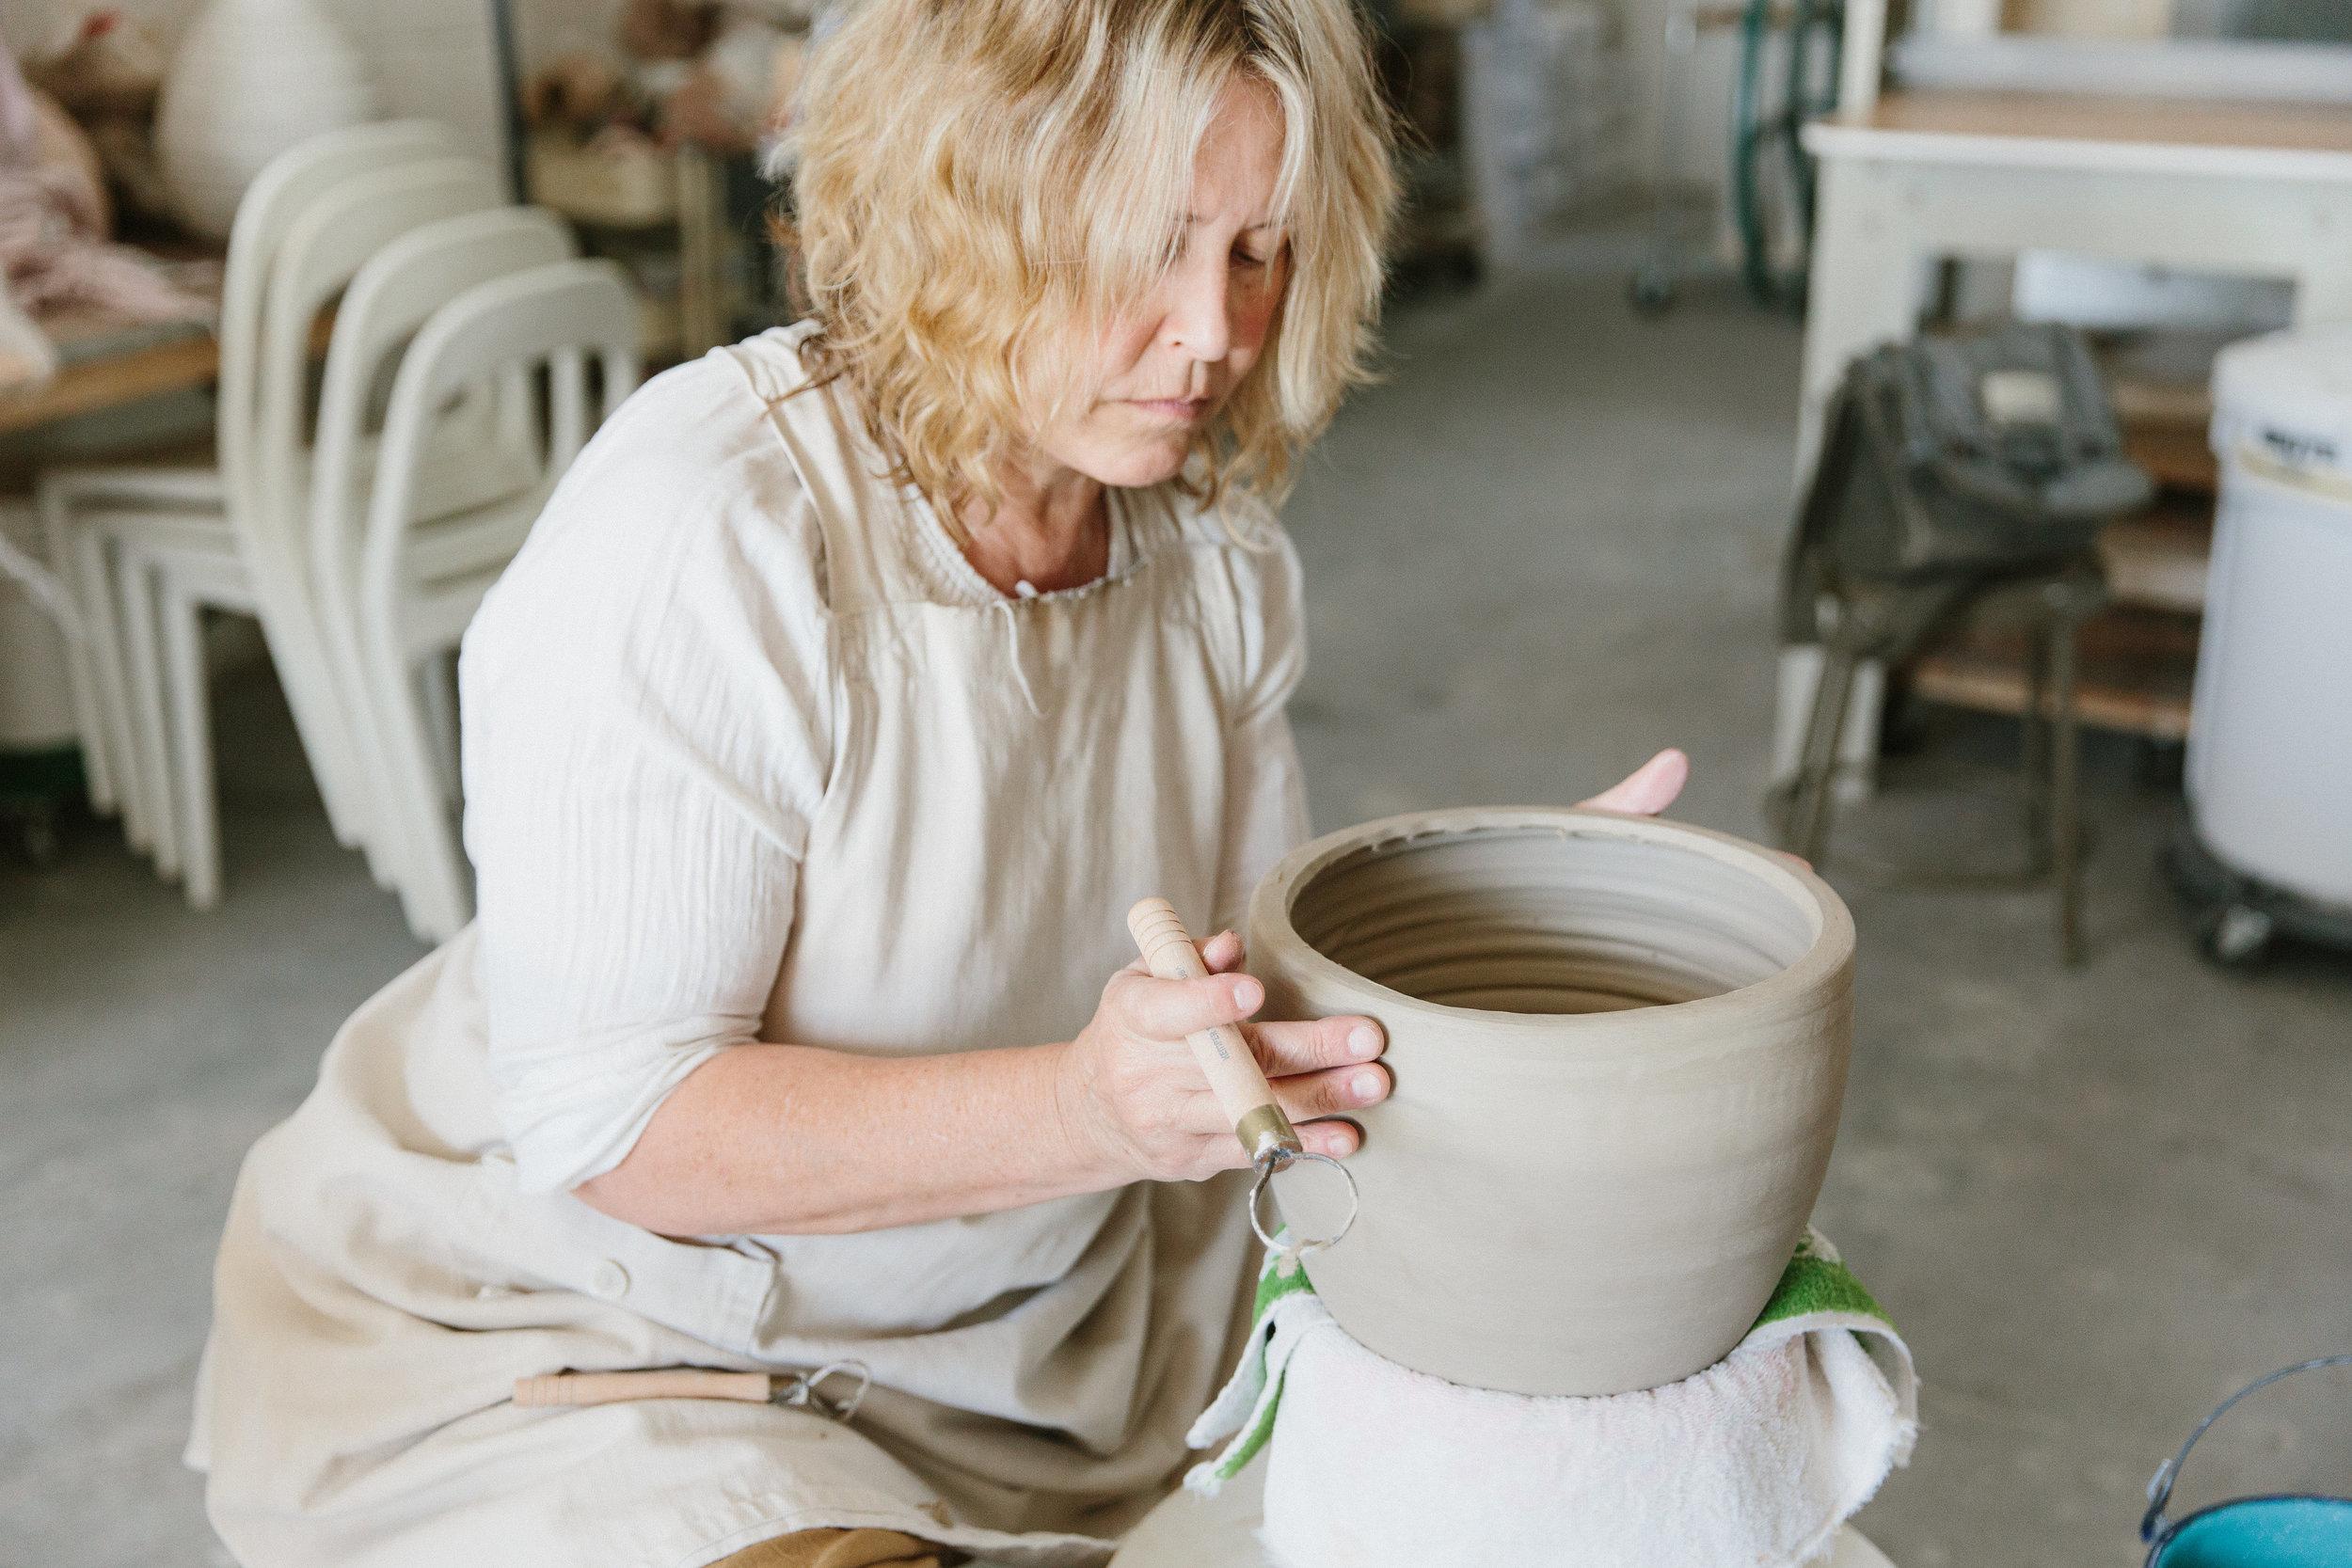 mt-washington-pottery_jenni-kayne_nicki-sebastian-photography-55.jpg